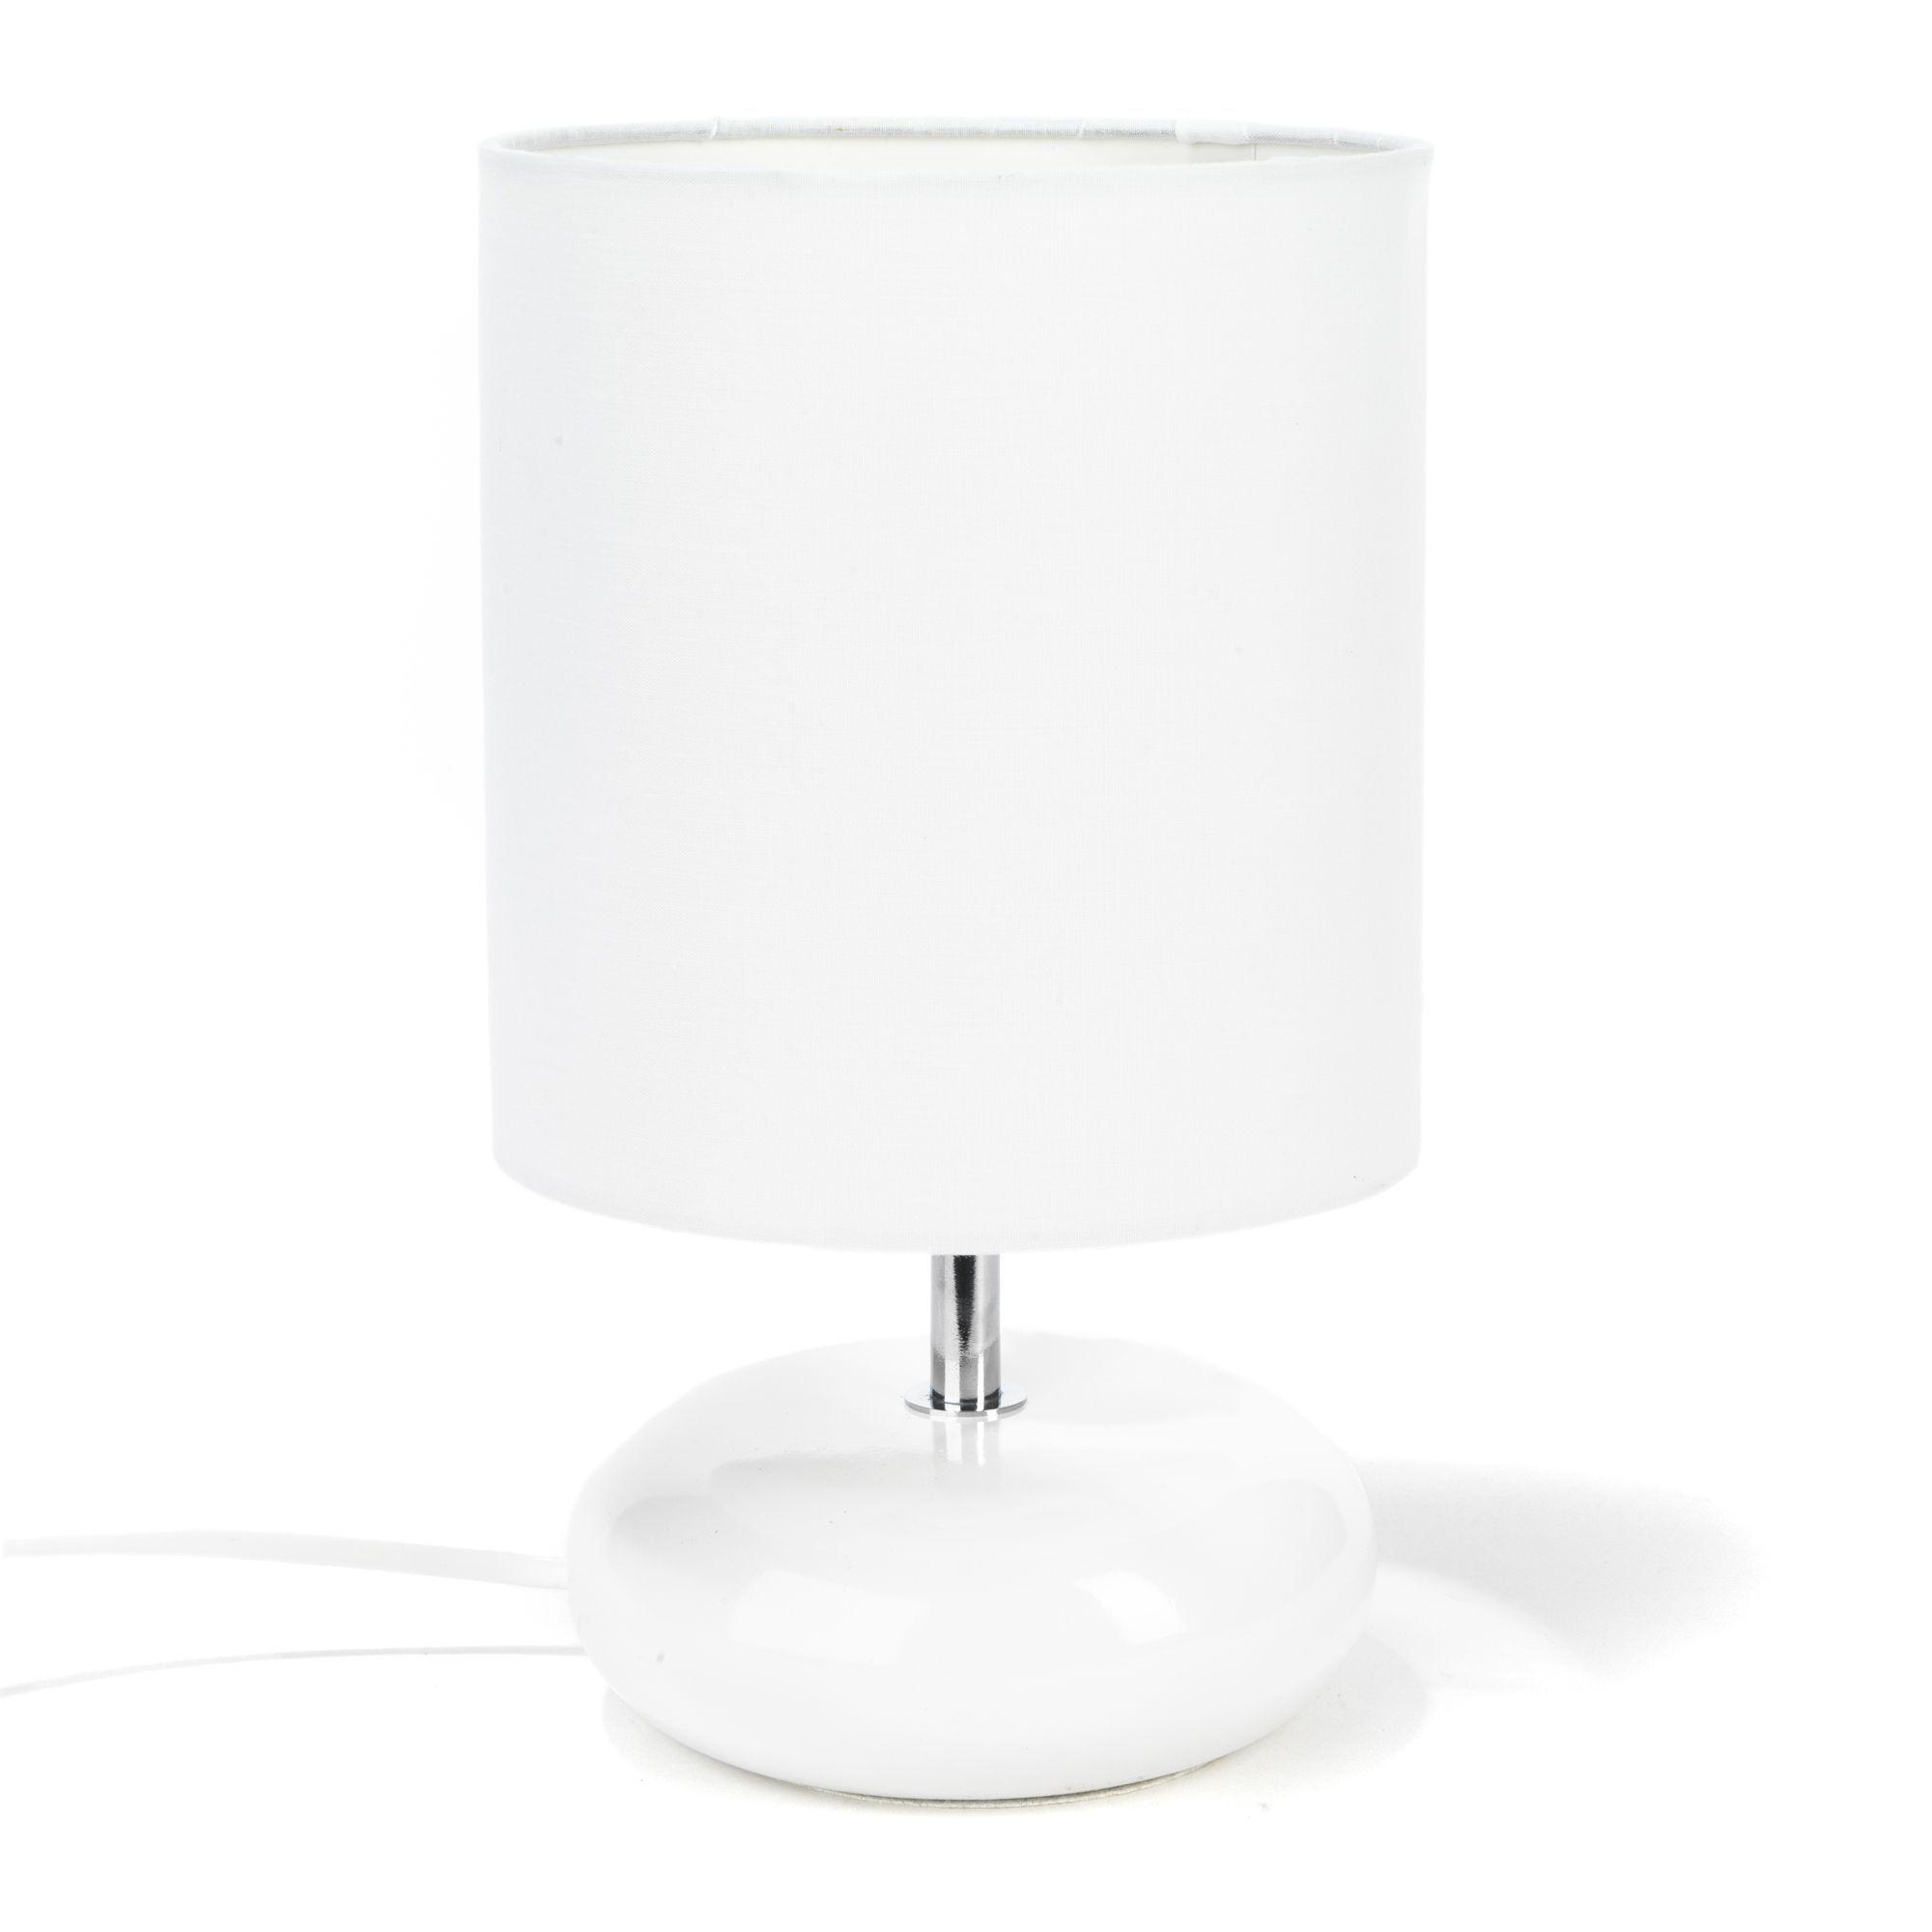 5 90 Lampe Avec Abat Jour Liz Lum Lampes Alinea Lampes